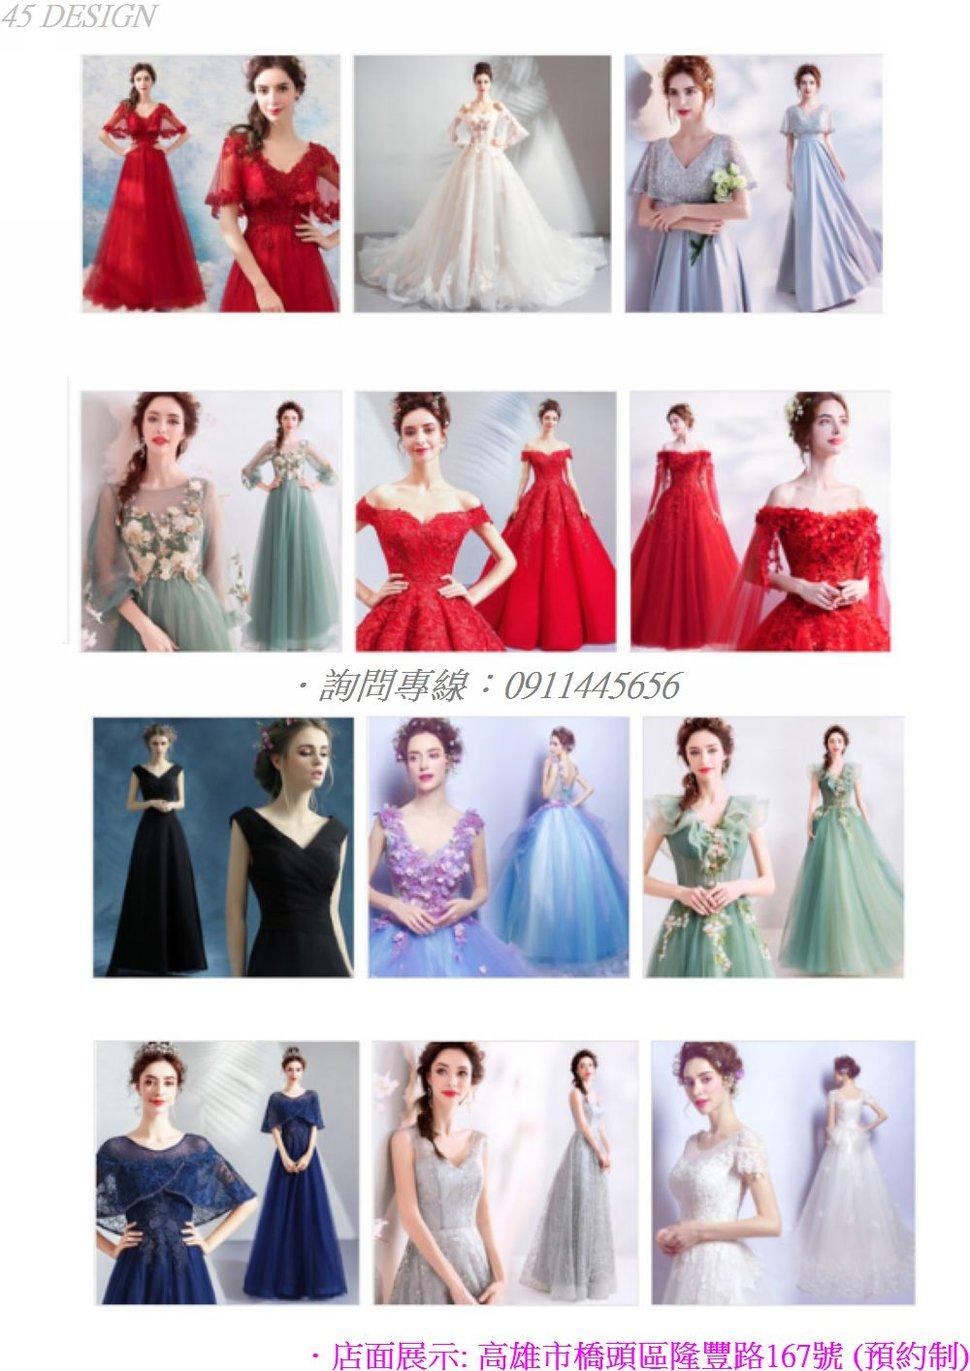 msl19081511D23A2112B1409FB85ADEF403C8B9AB - 全台最便宜-45DESIGN四五婚紗禮服《結婚吧》